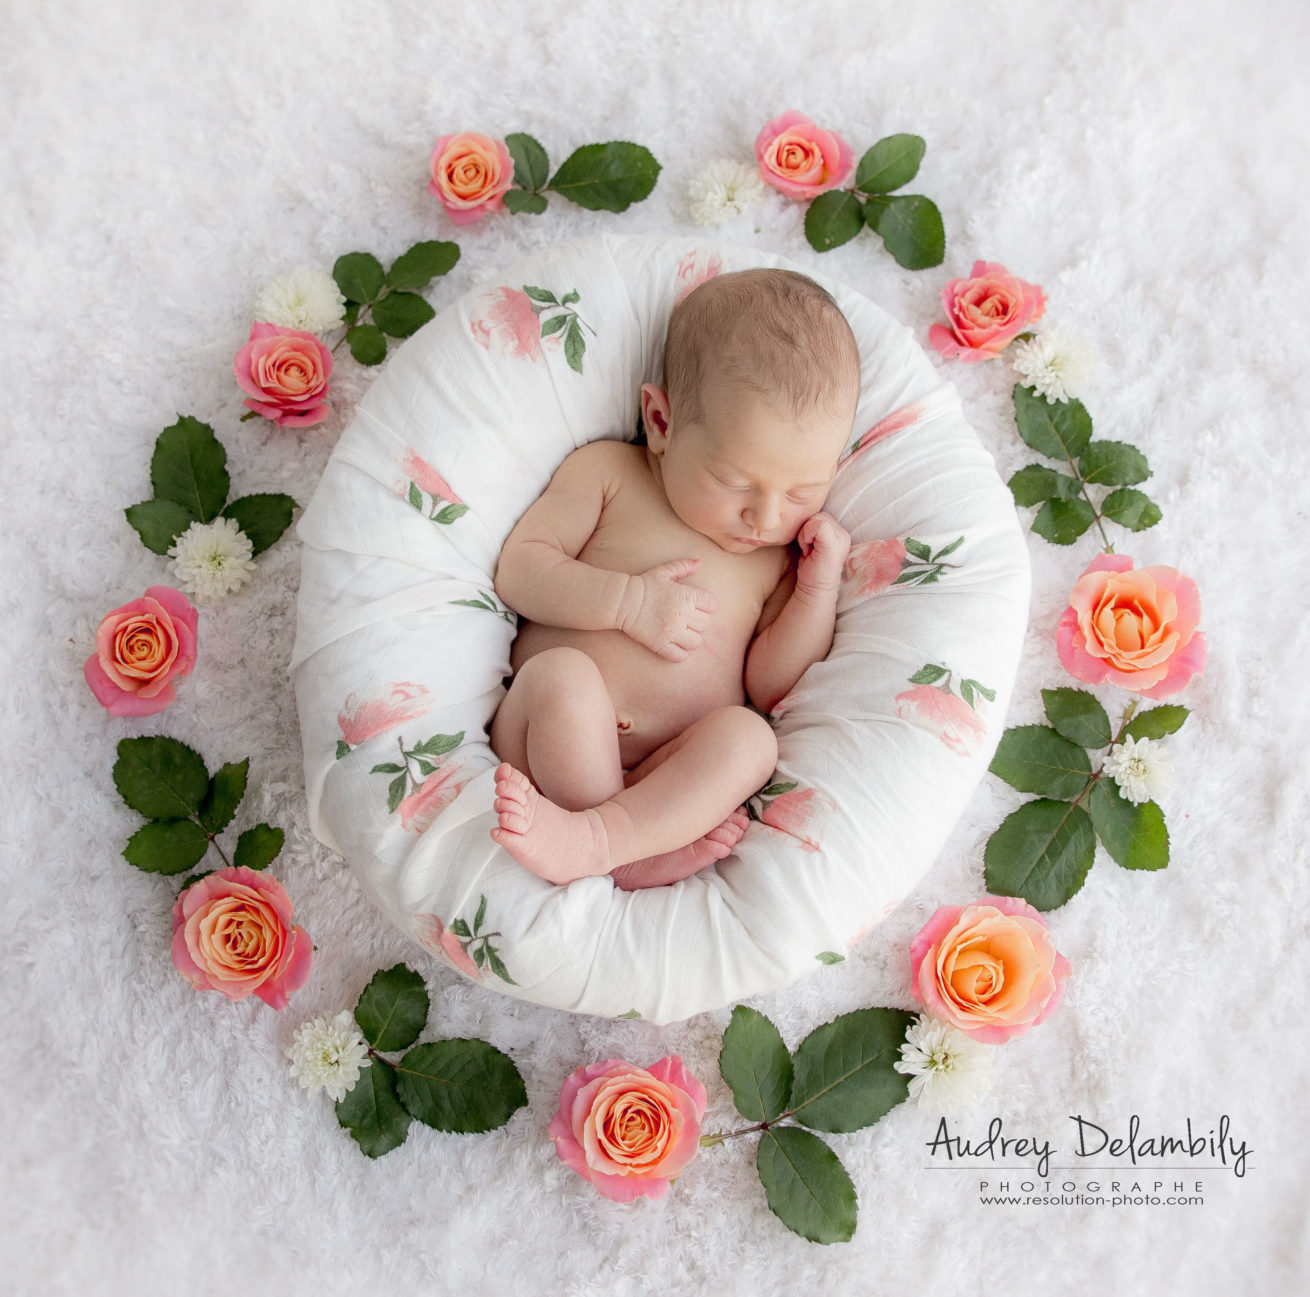 seance-photo-bebe-toulon-hyeres-bandol-sanary-var-audrey-delambily-photographe